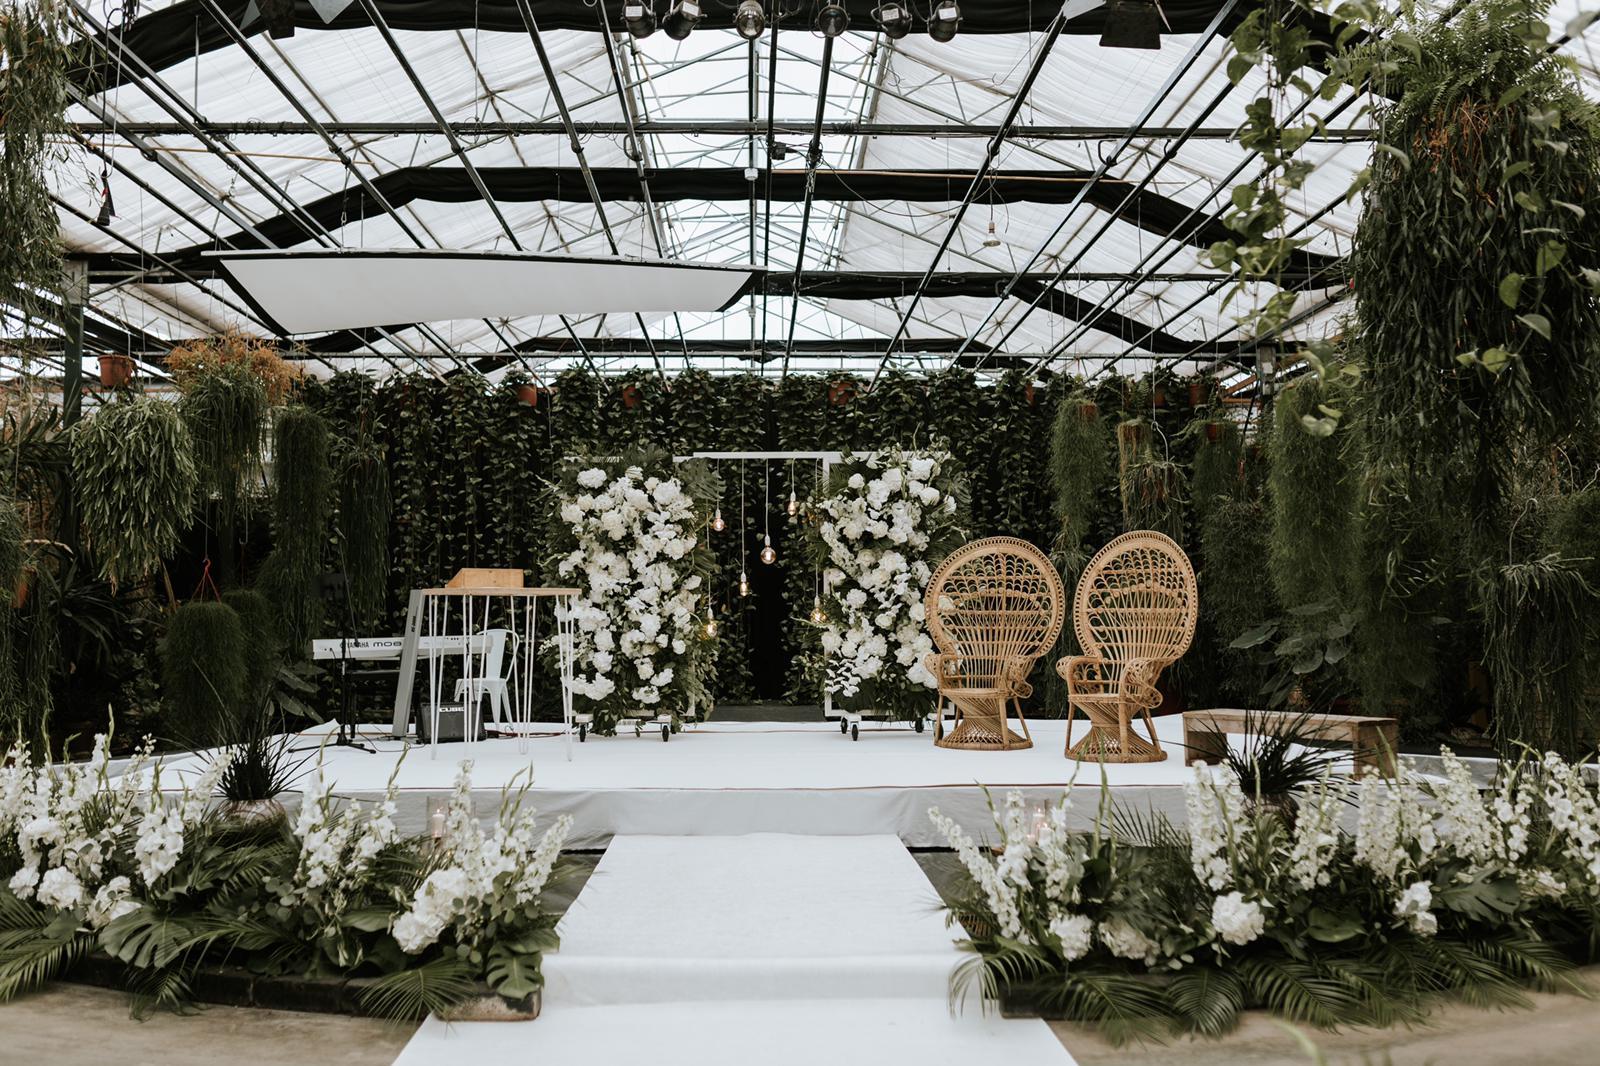 #apbloem #florist #bloemist #amsterdam #bloemenwinkel #kerkstraat #bloemen #flowers  #weddingstyling #weddinggoals #bruiloft #trouwen #liefde #bride #wedding #marriage #bruidsboeket #floraldesign #mordernwedding #modernbride #greenhouse #kas #planten #styling #interiorstyling